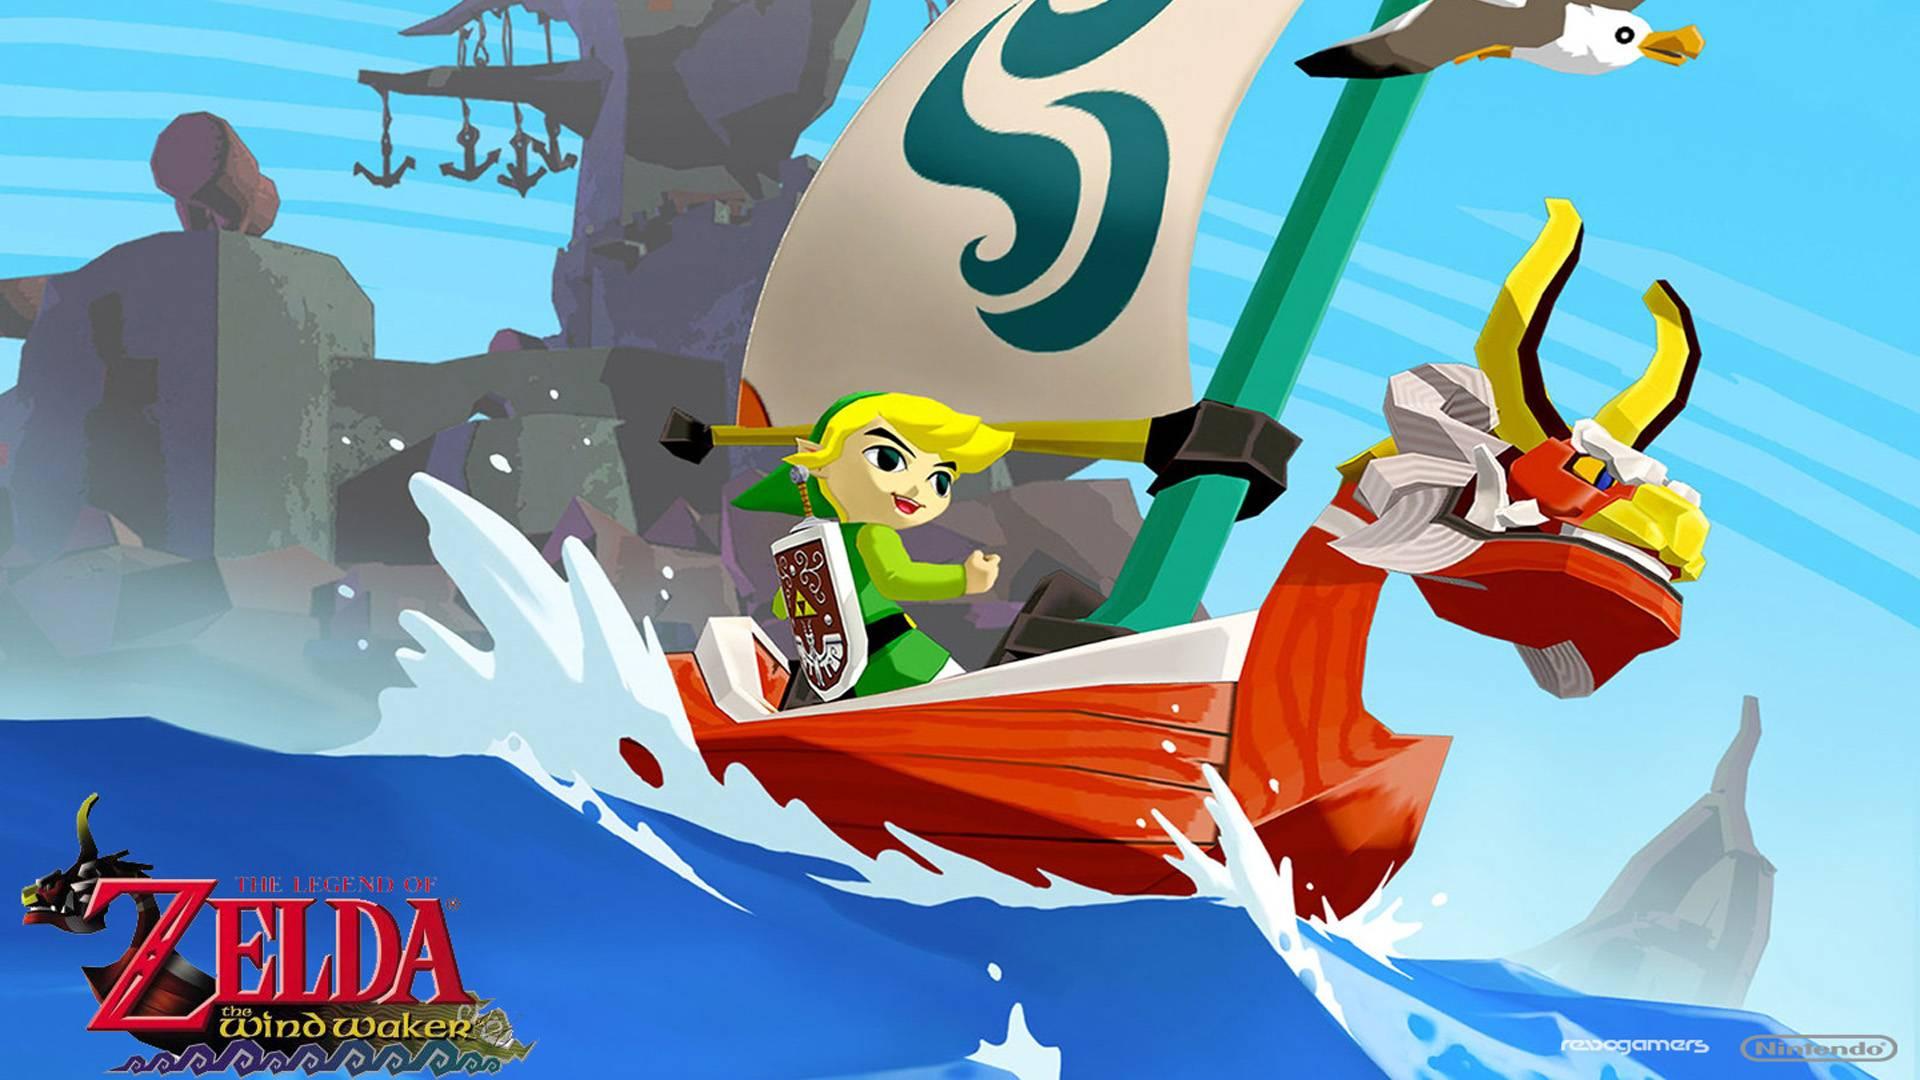 The Legend of Zelda Wind Waker HD Wallpapers GamingBoltcom Video 1920x1080